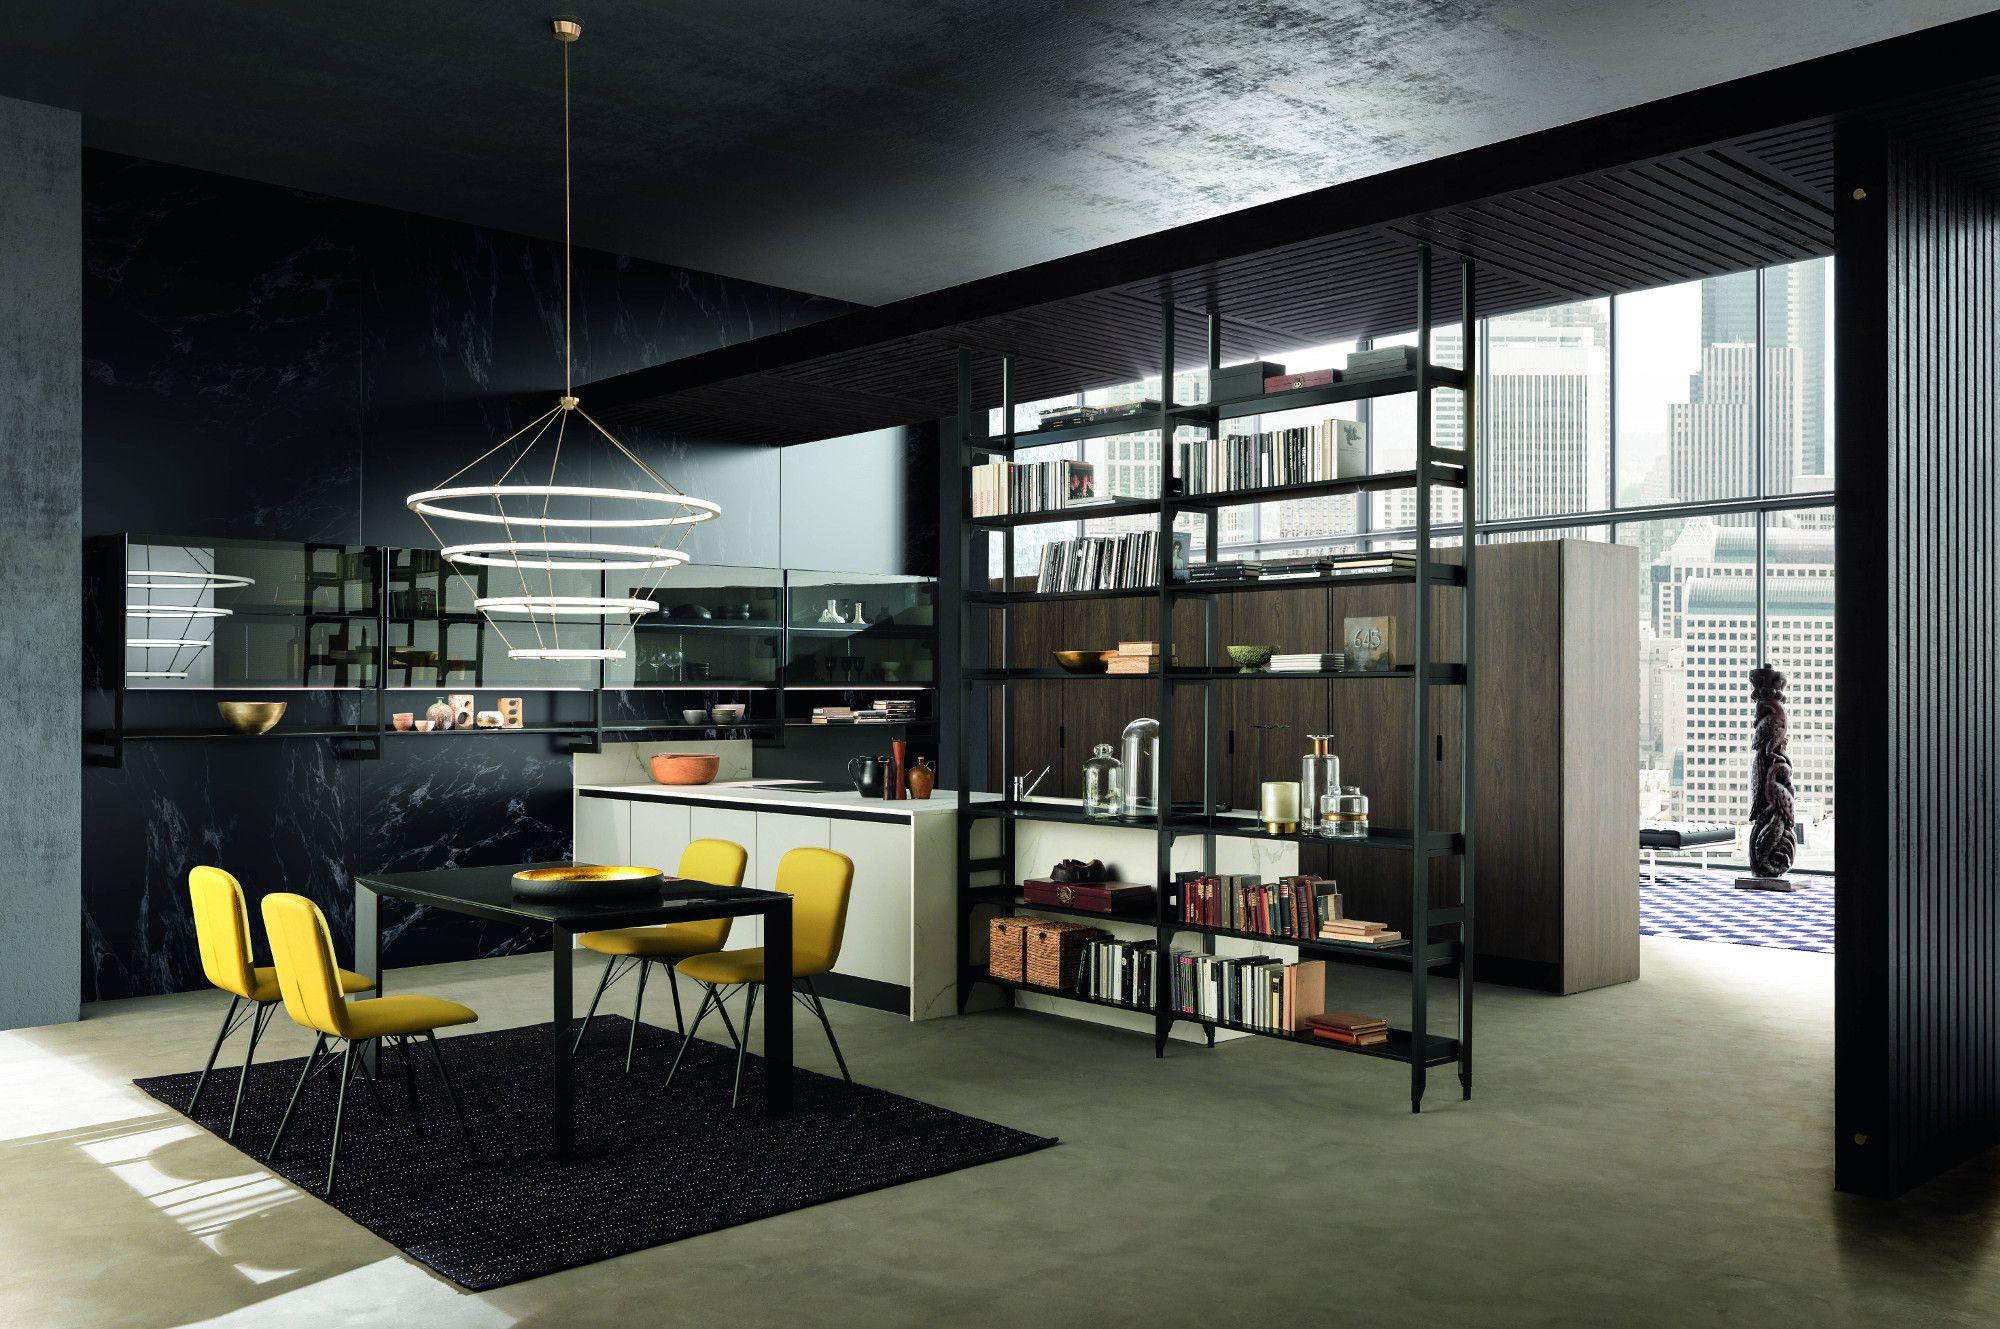 Kaleidos ginocchi arredamenti arredo interni cucina for Cucine moderne scure